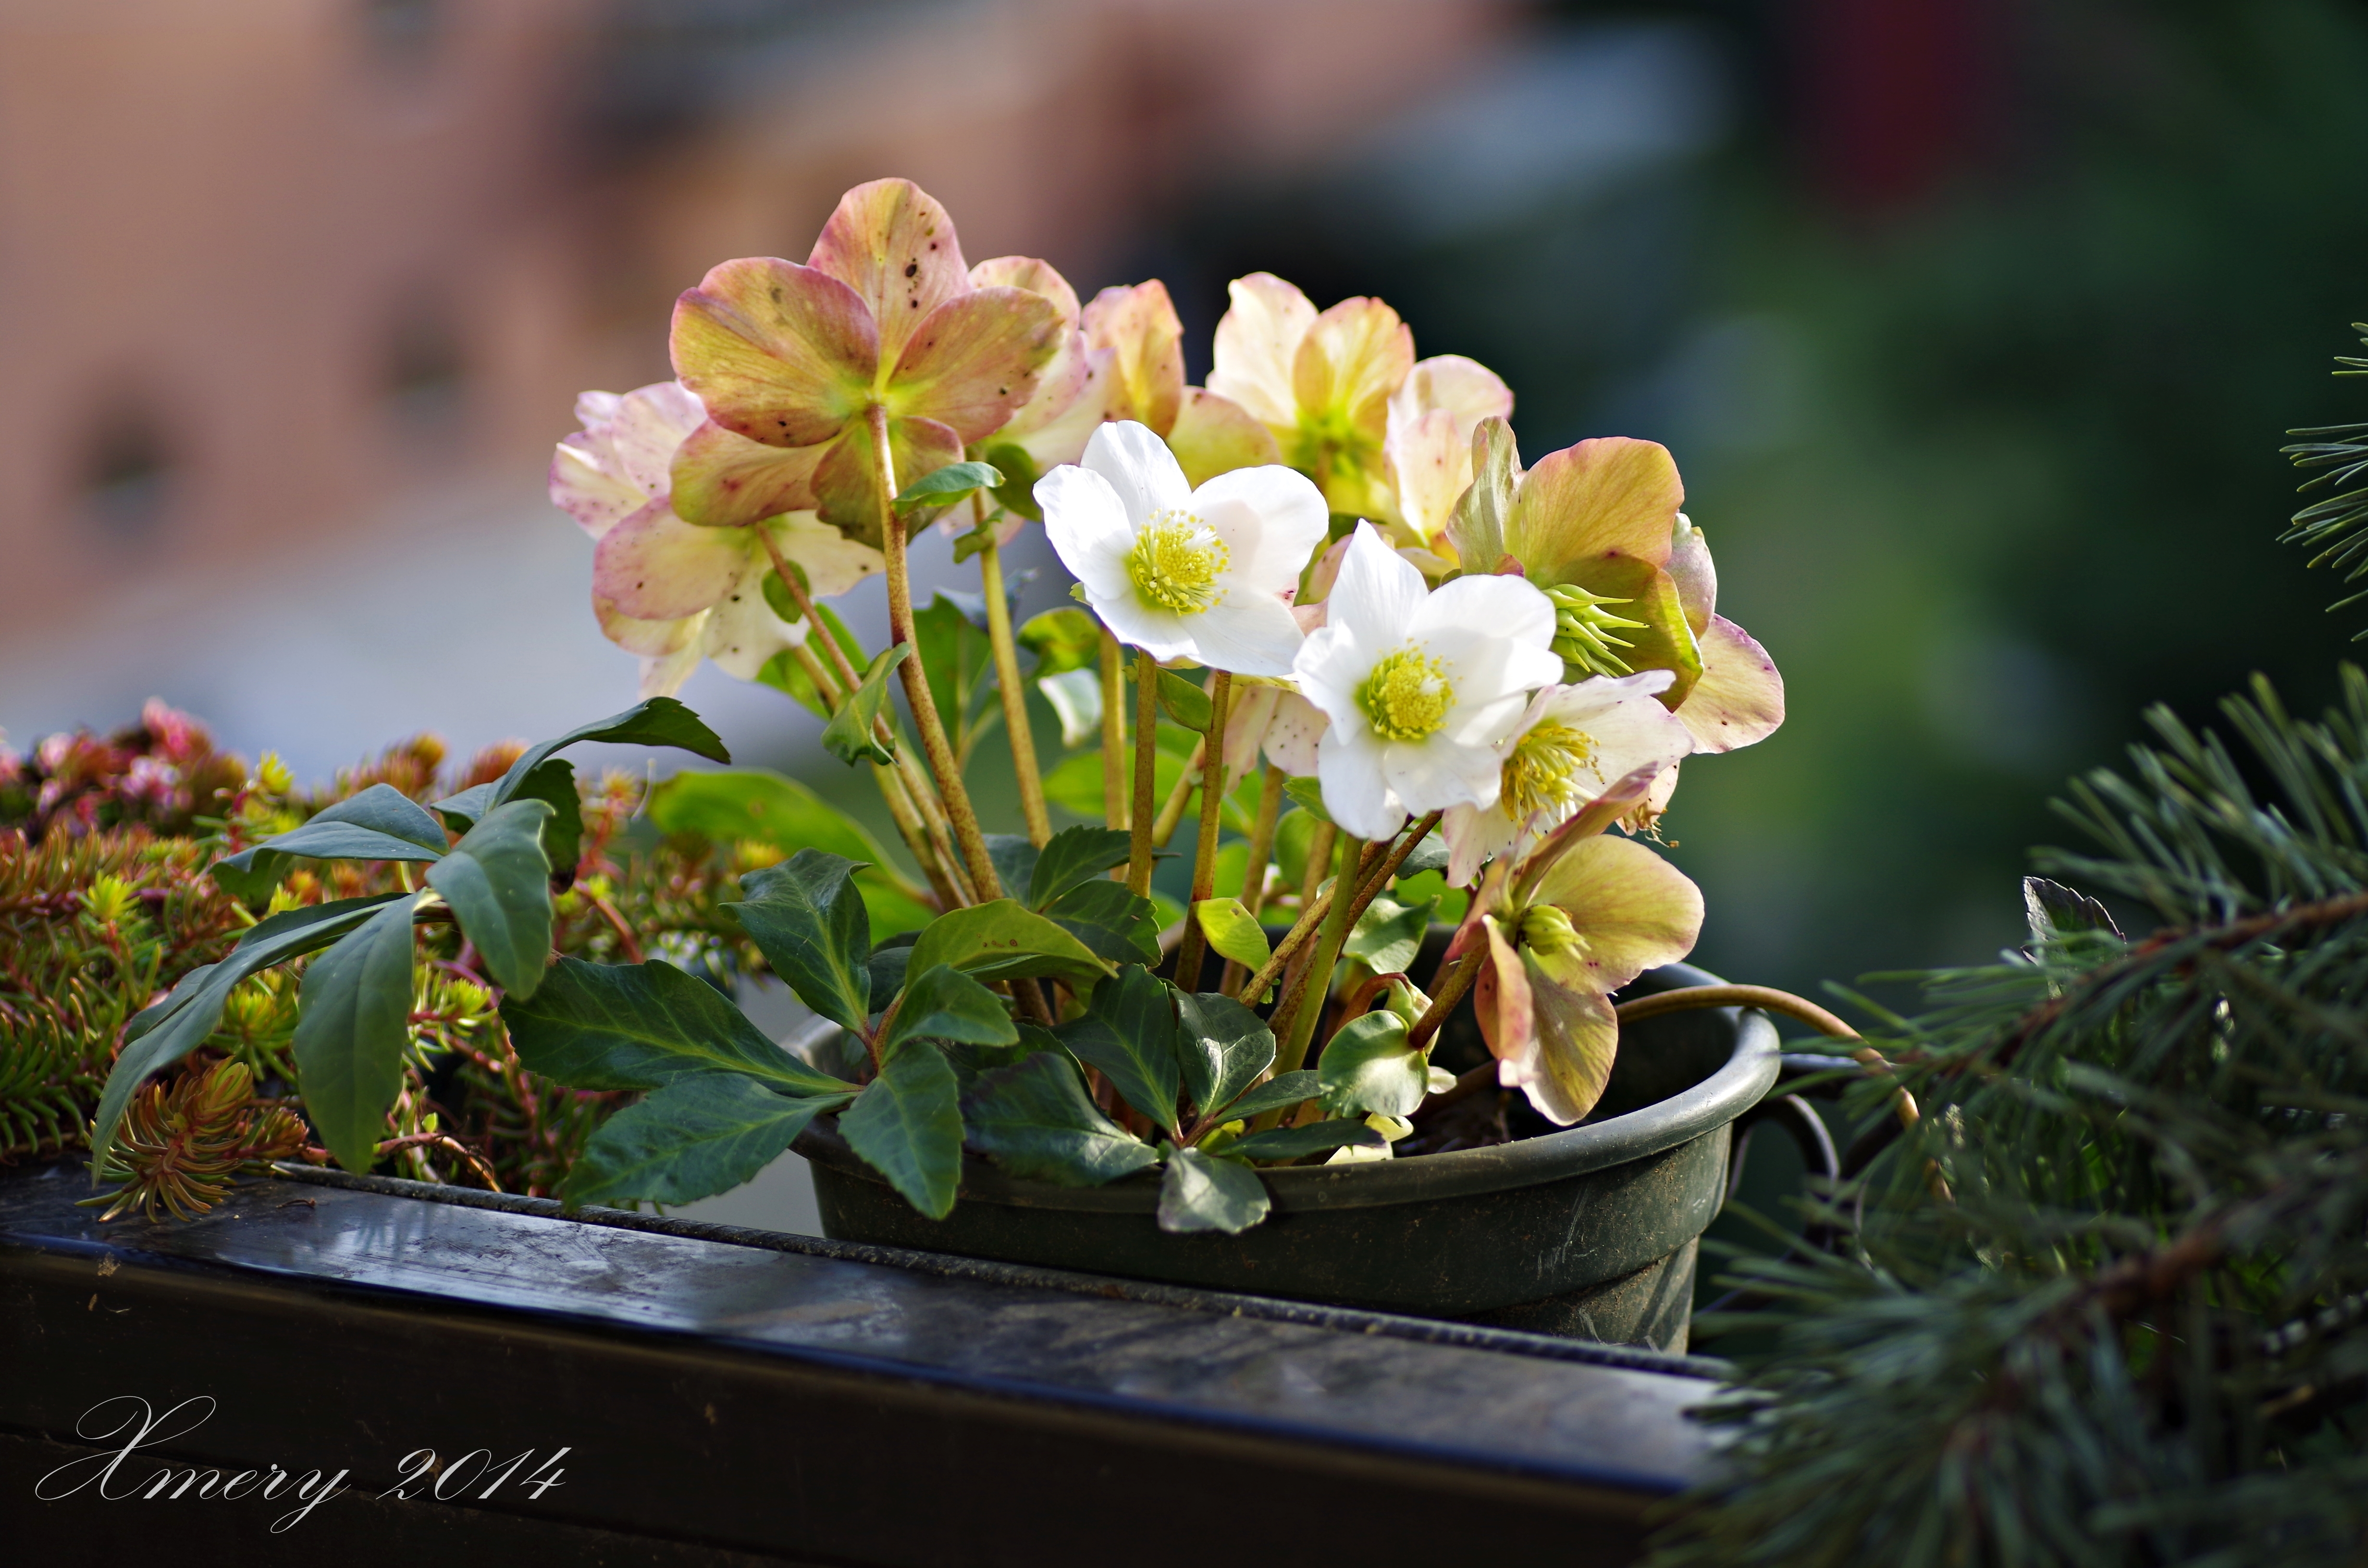 Helleborus niger rosa di natale o elleboro nero for Elleboro bianco